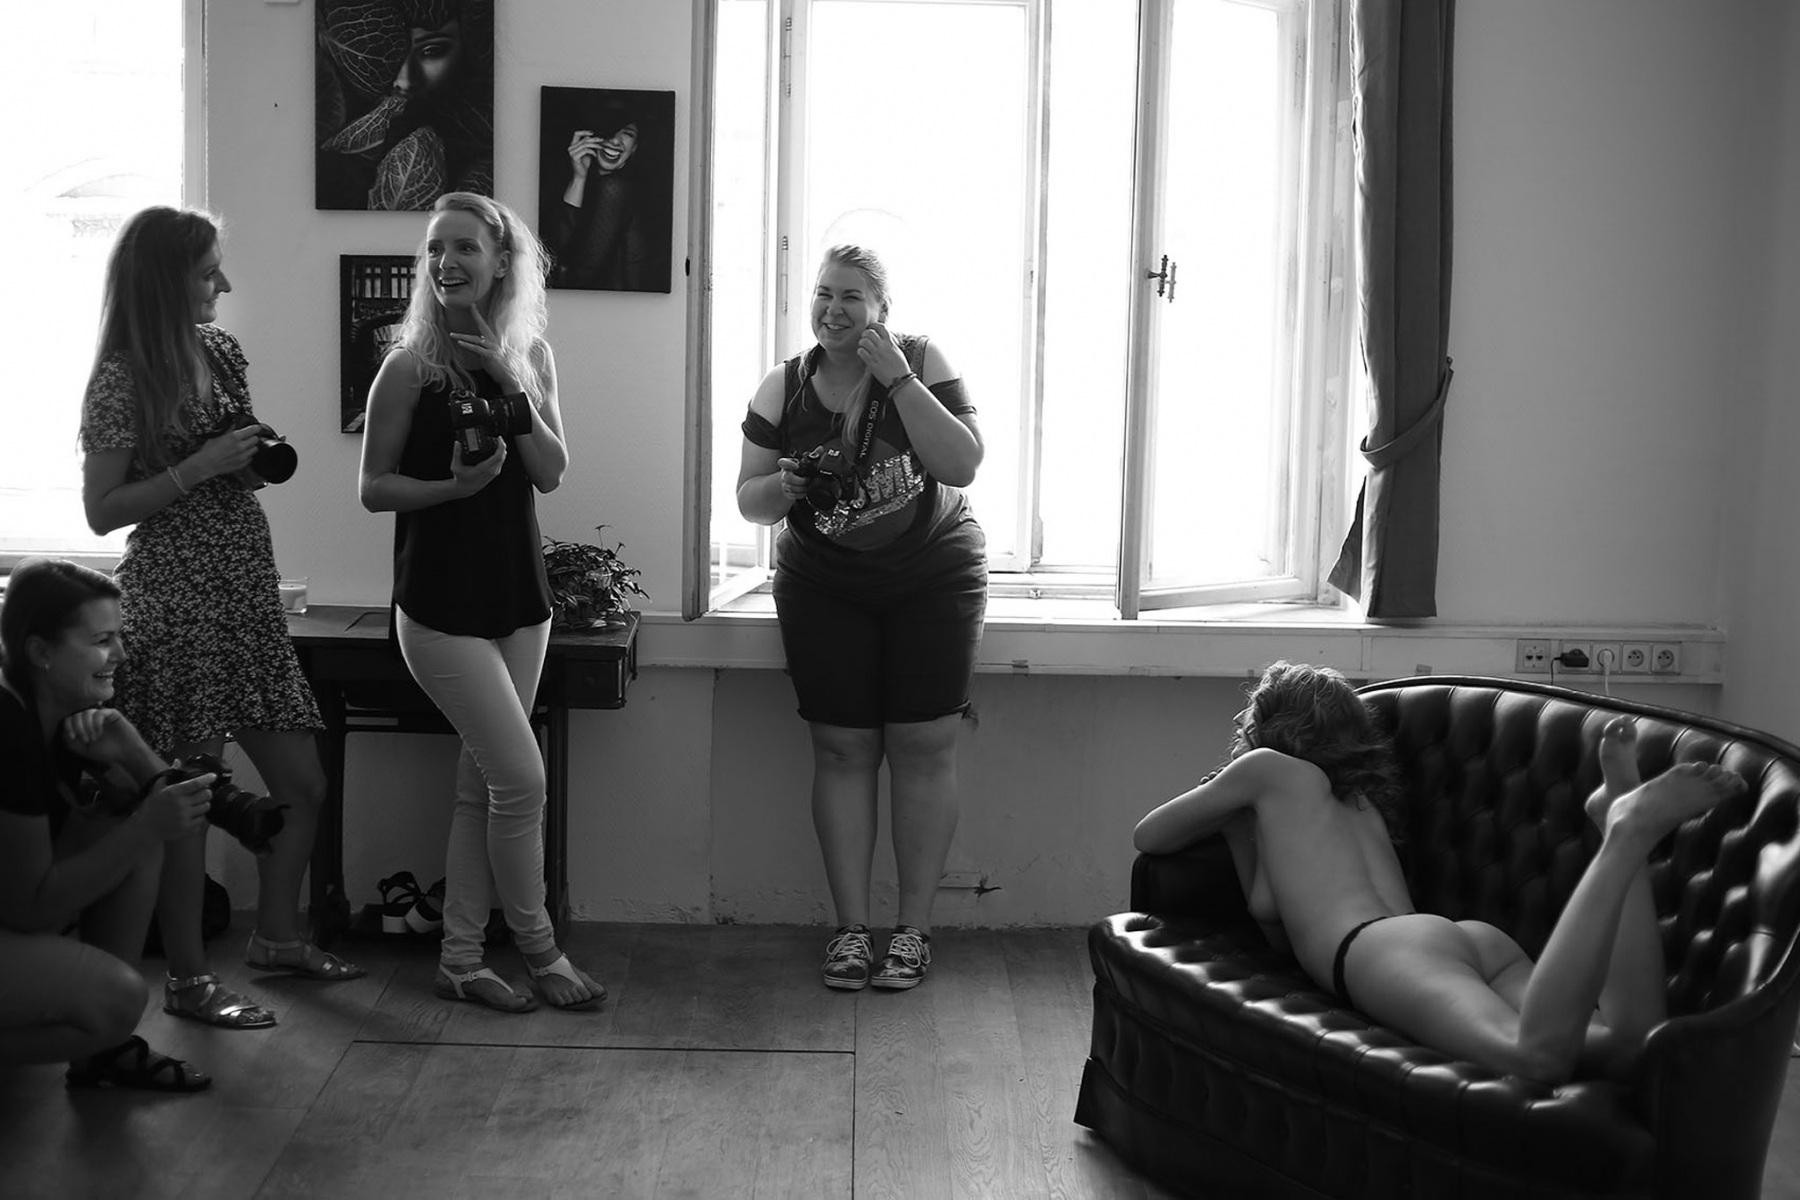 Katerina_Janisova_Masterclass_Workshop_Fotokurz-10